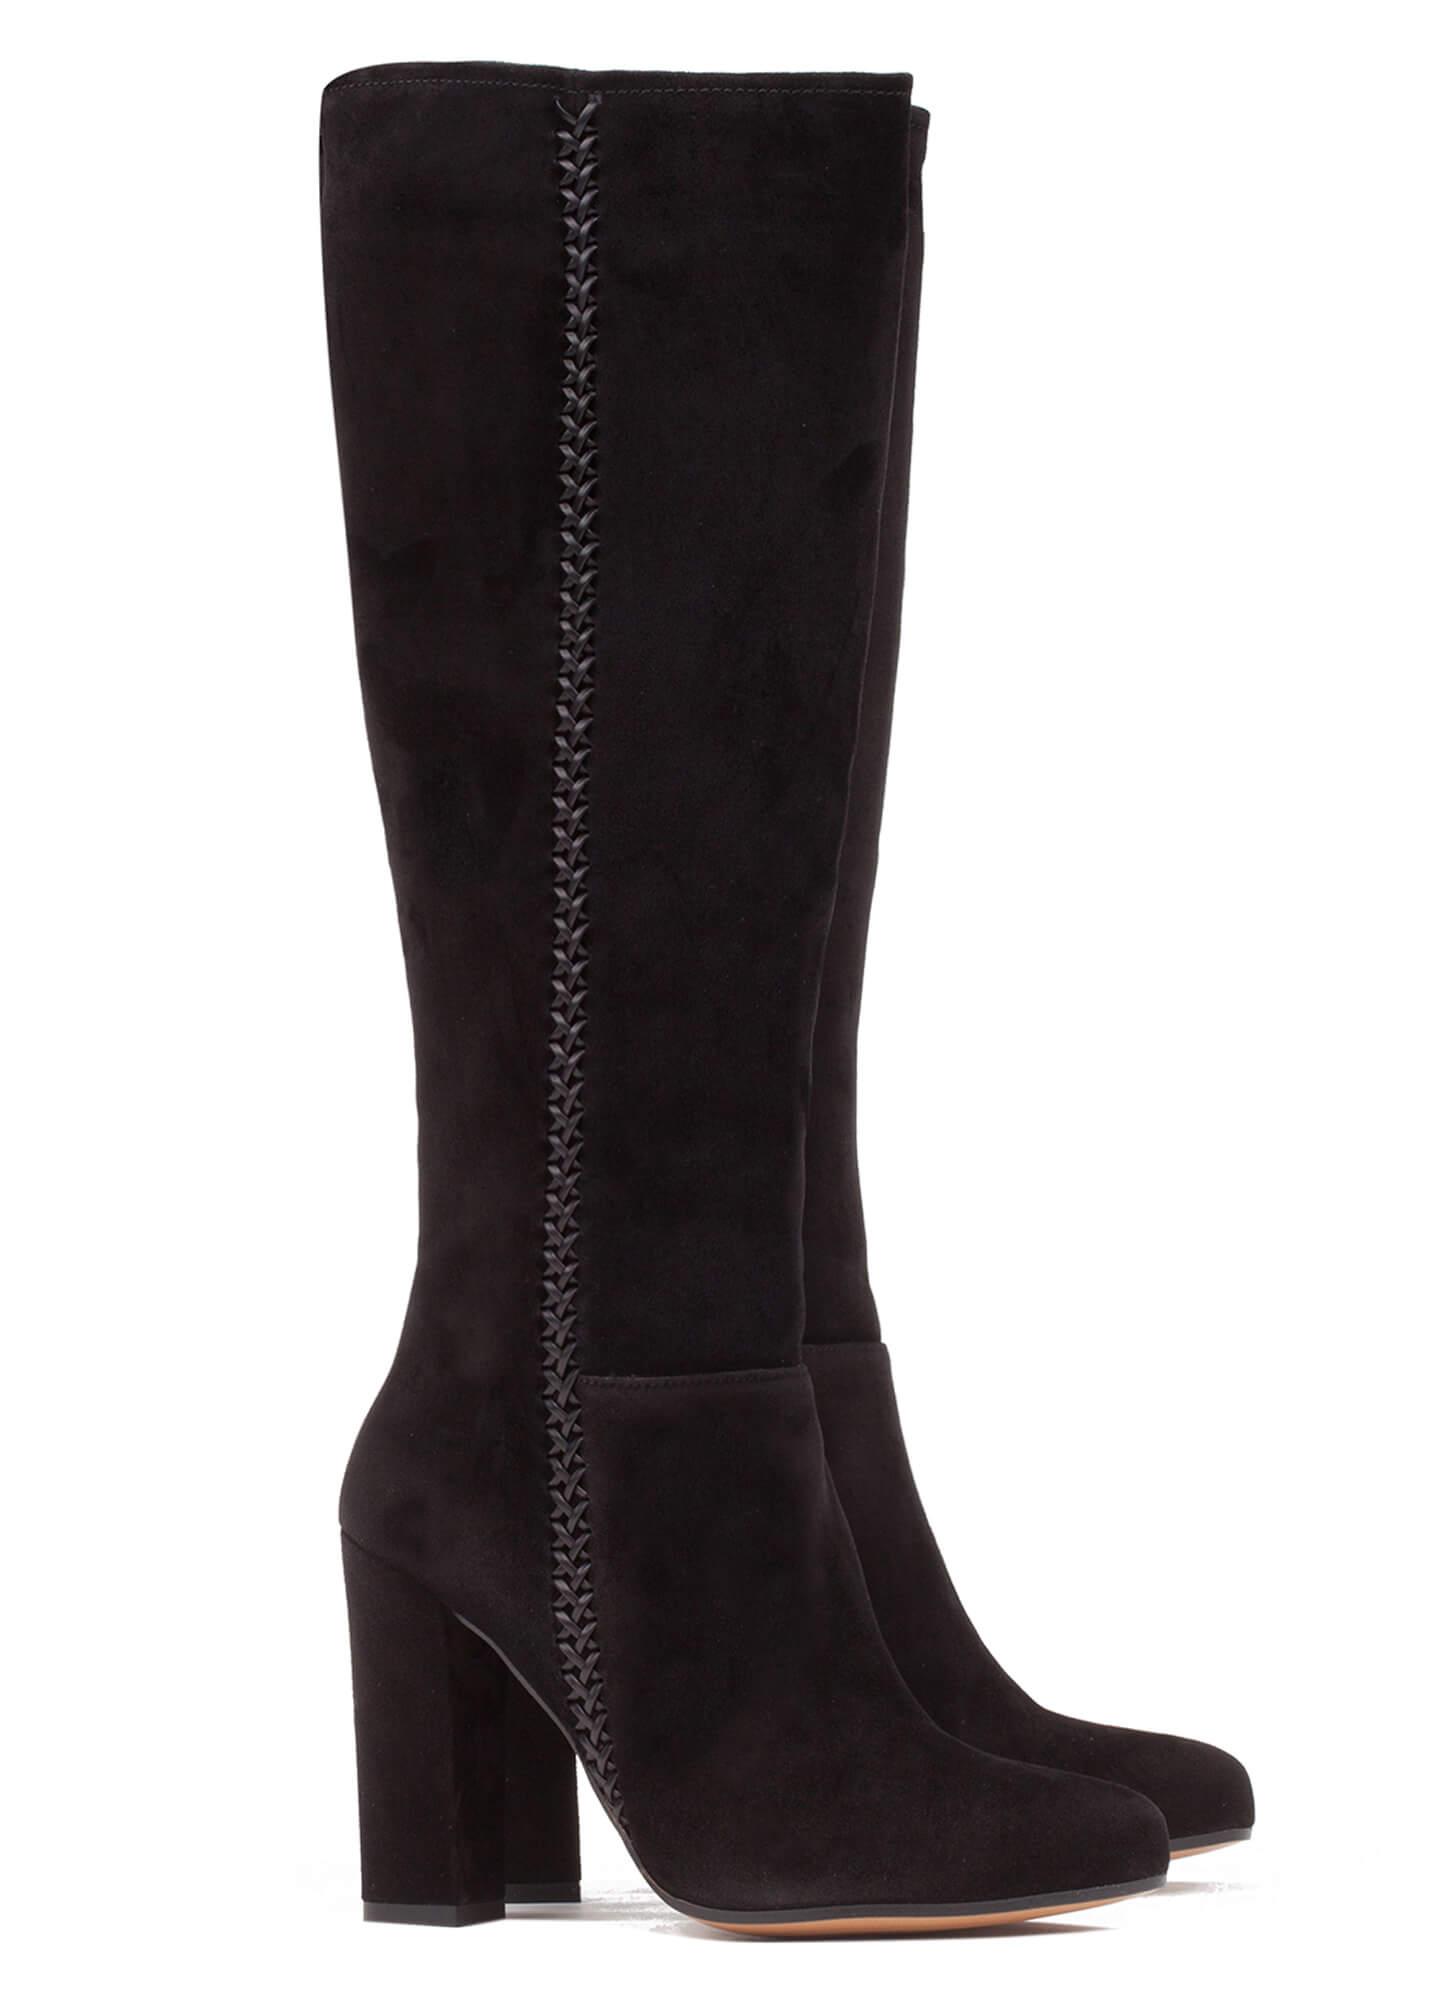 Black high heel boots - online shoe store Pura Lopez . PURA LOPEZ